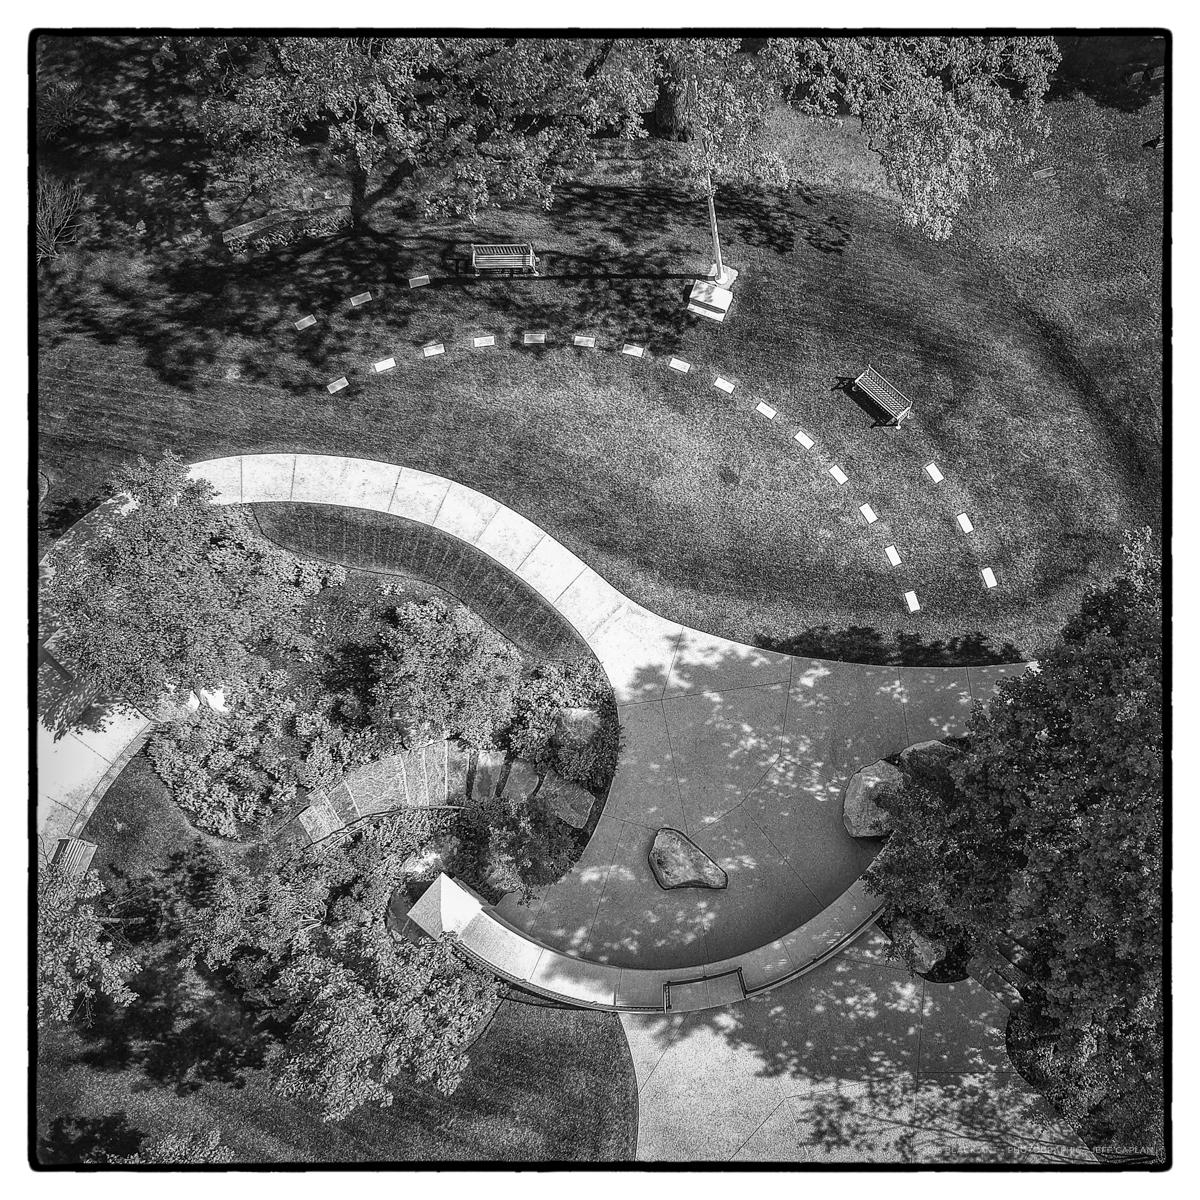 Lowell_Cemetery_Crem_Wall_Aerial_2018_Jeff_Caplan.jpg